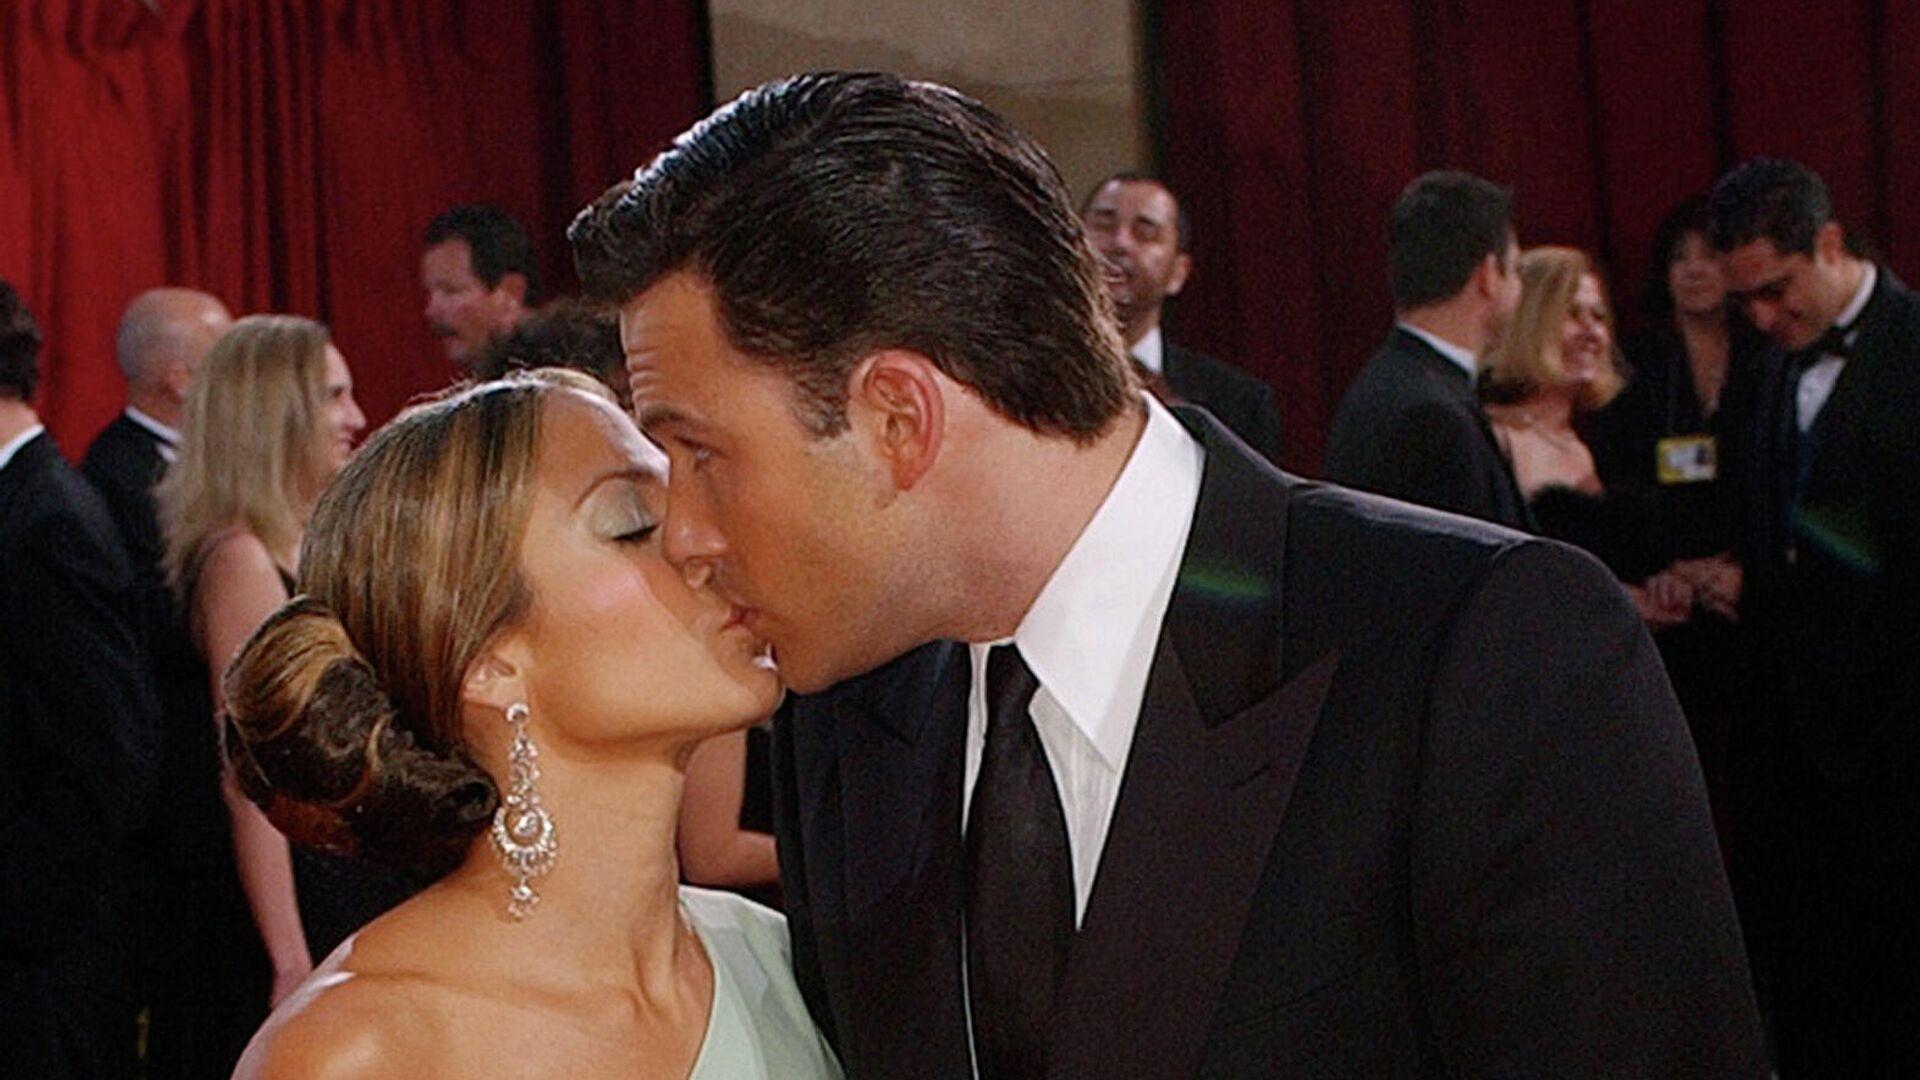 La cantante Jennifer López y el actor Ben Affleck en 2003 - Sputnik Mundo, 1920, 04.06.2021